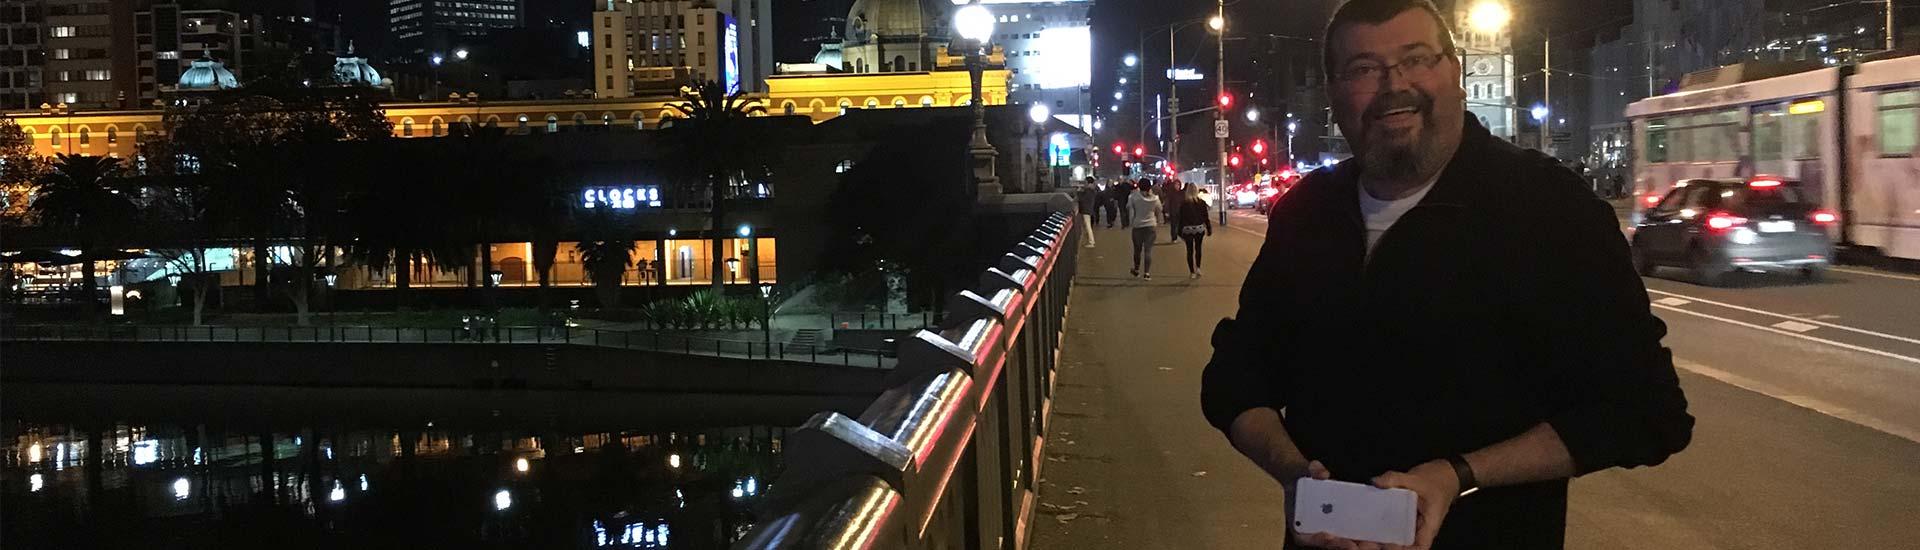 David Melbourne city at night